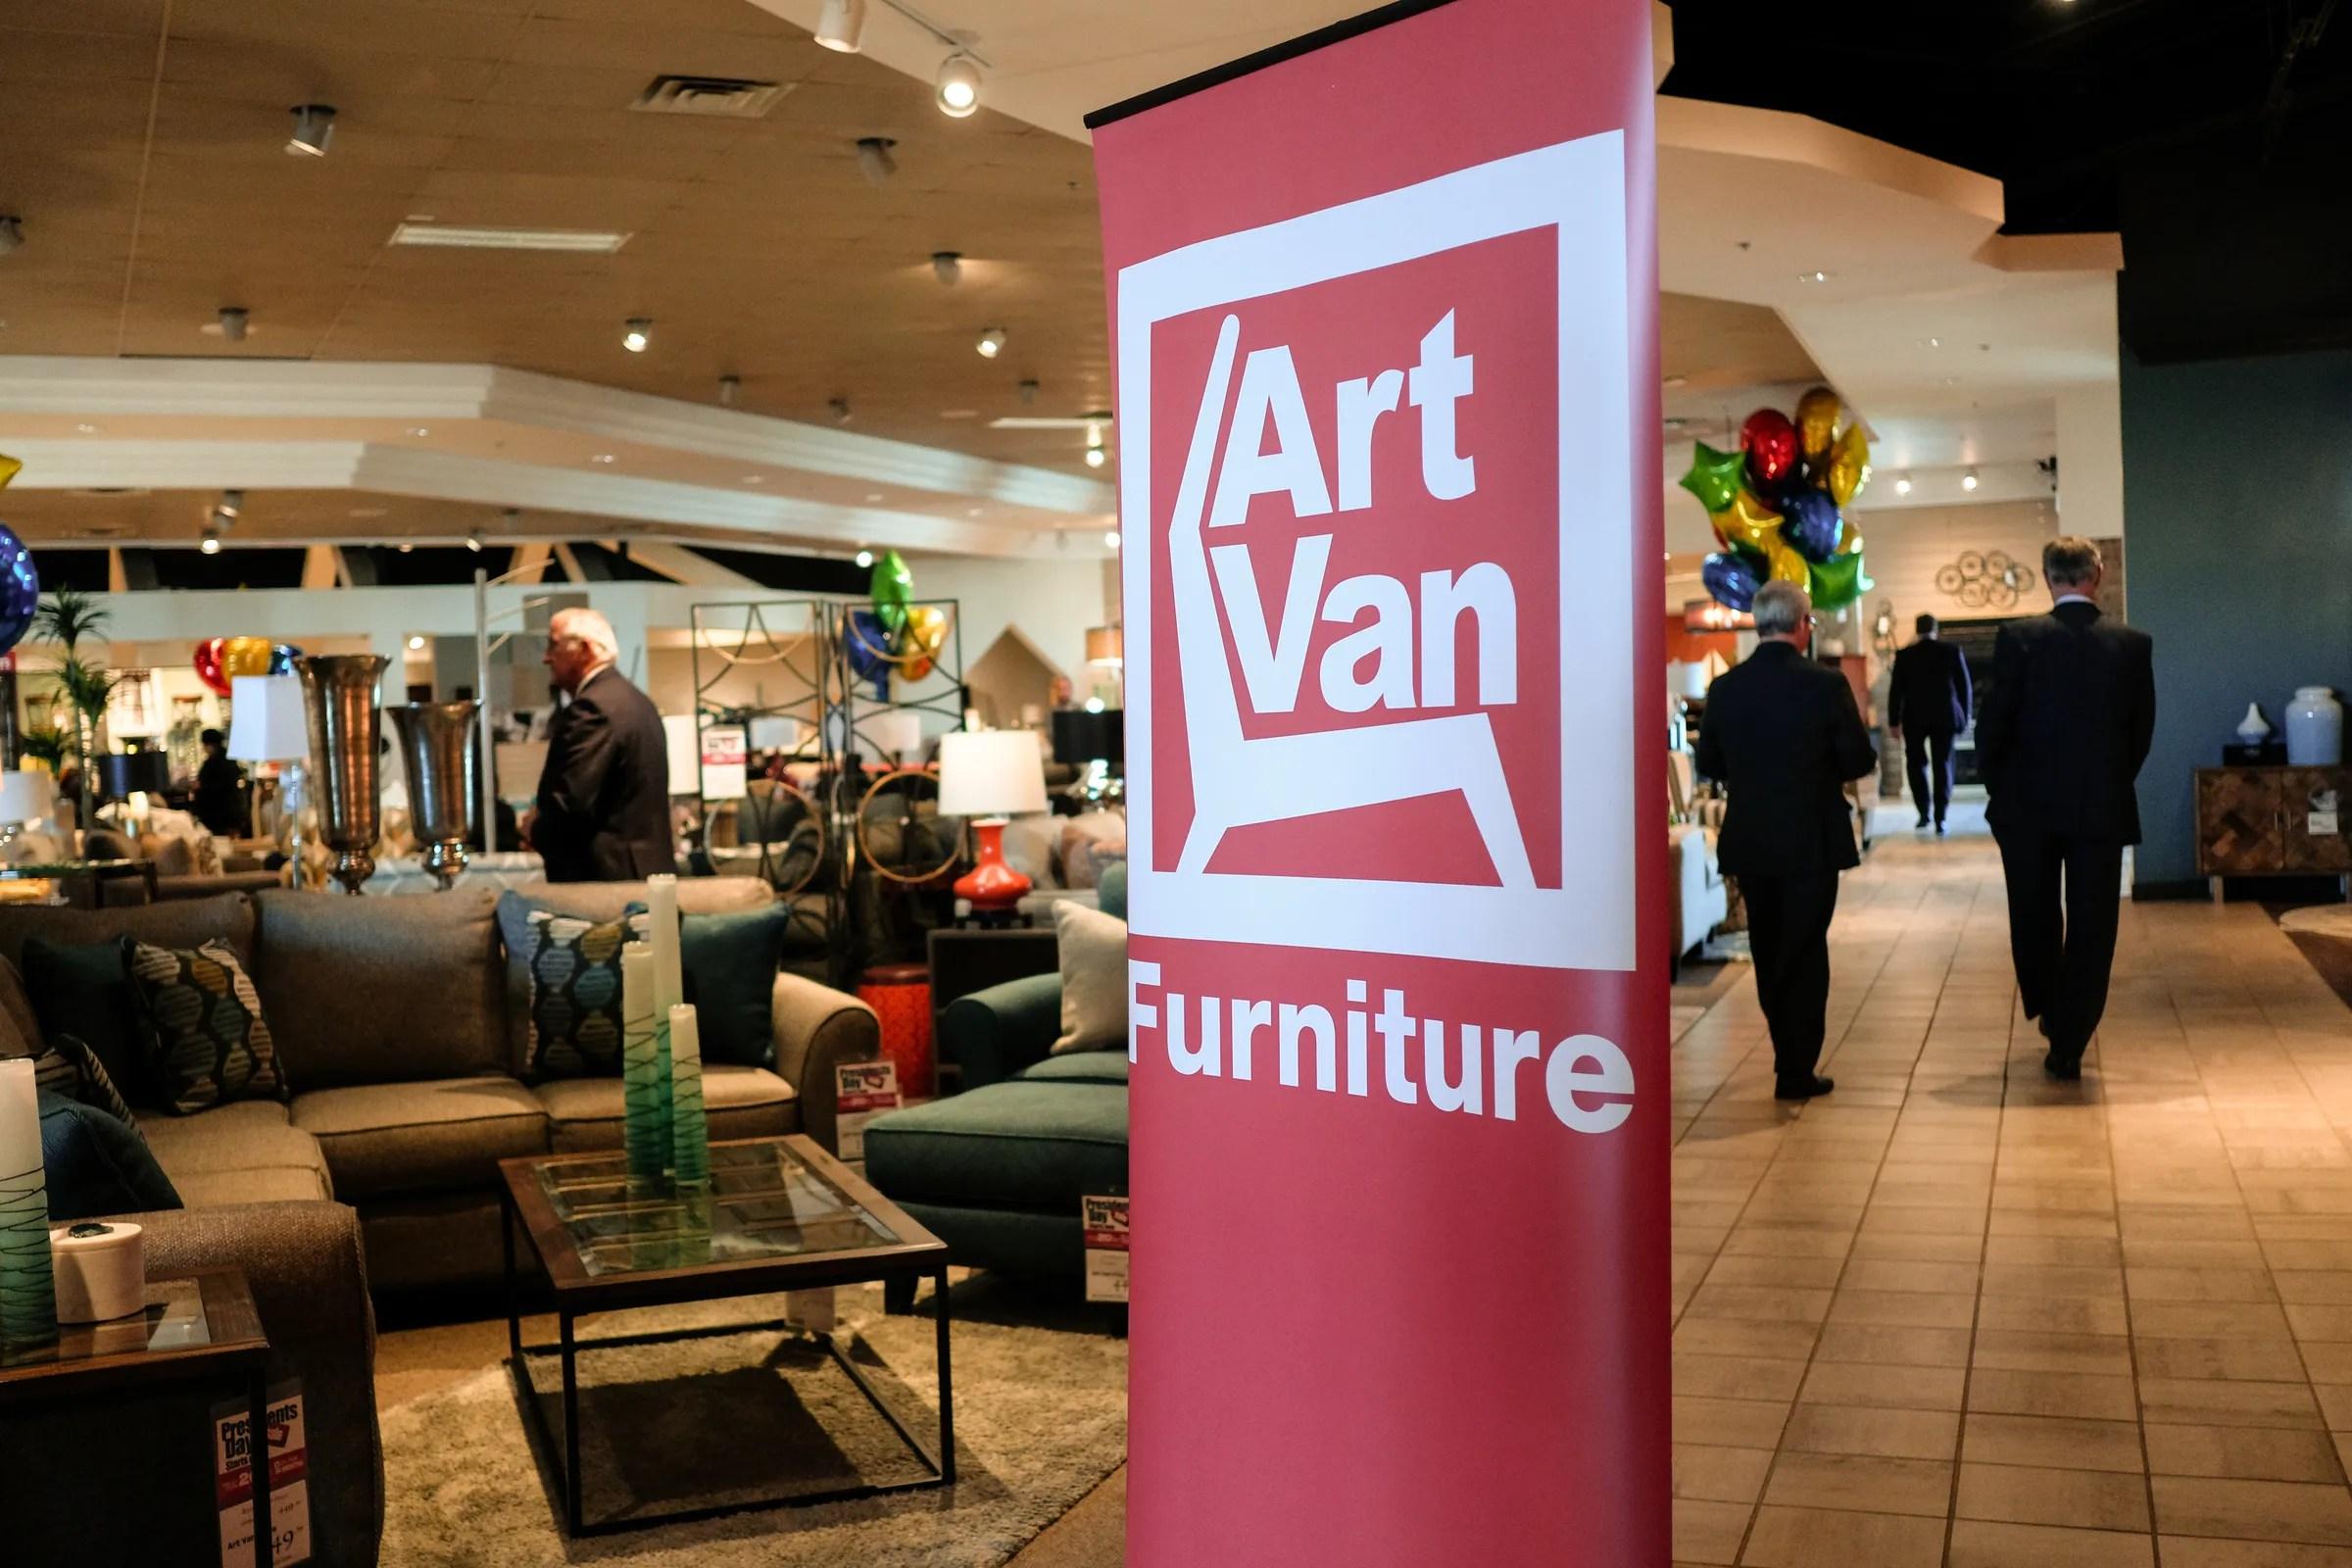 former art van furniture employees sue